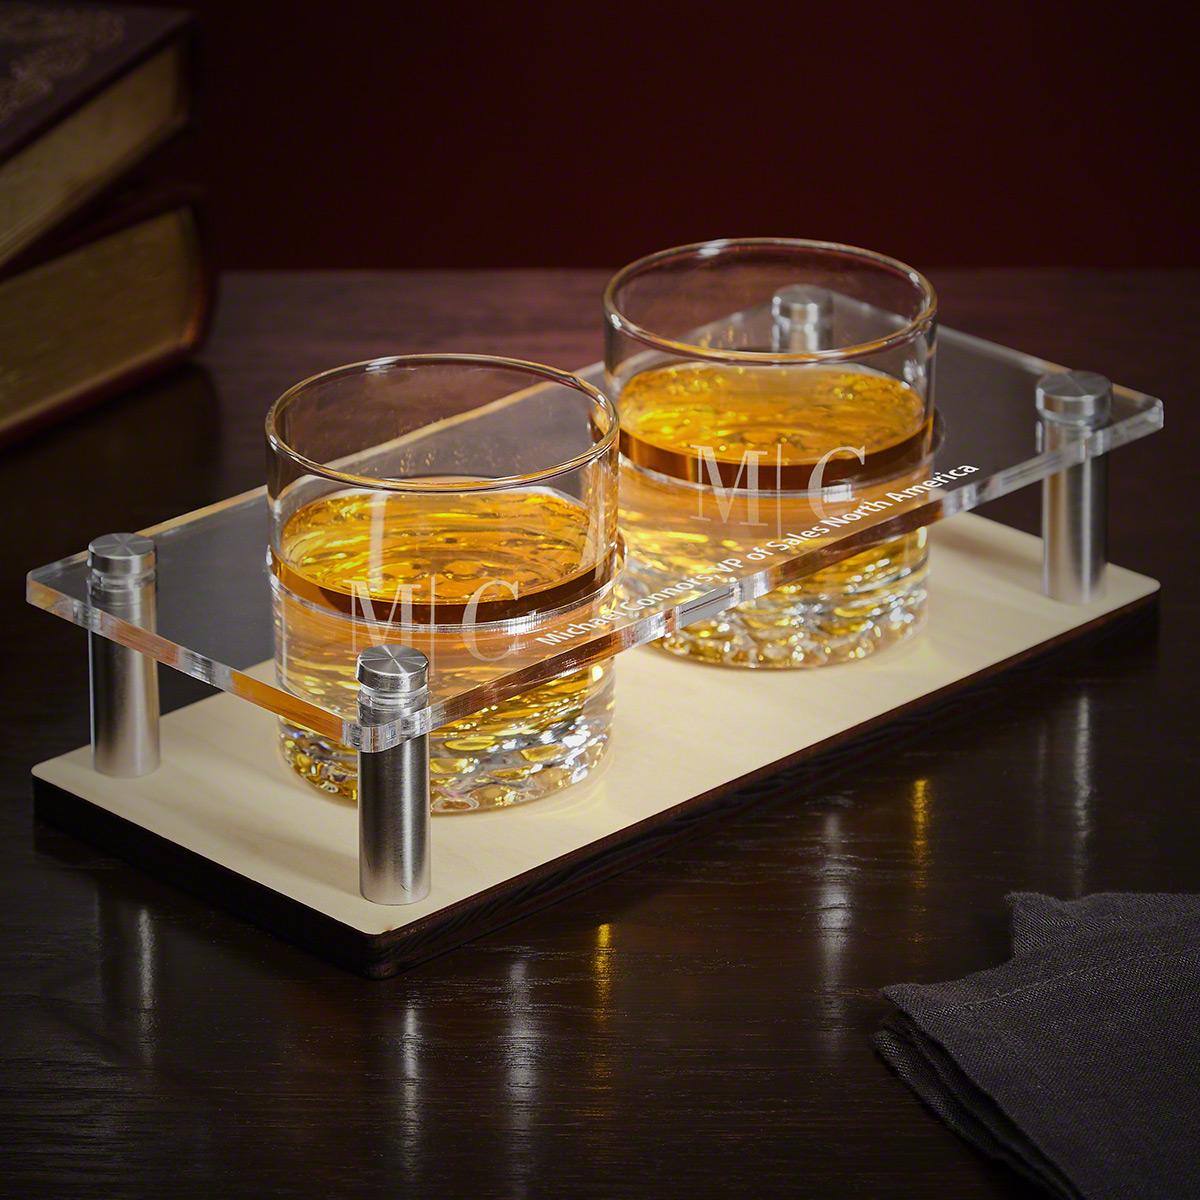 Quinton Monogram Presentation Set with Whiskey Glasses 3 pc